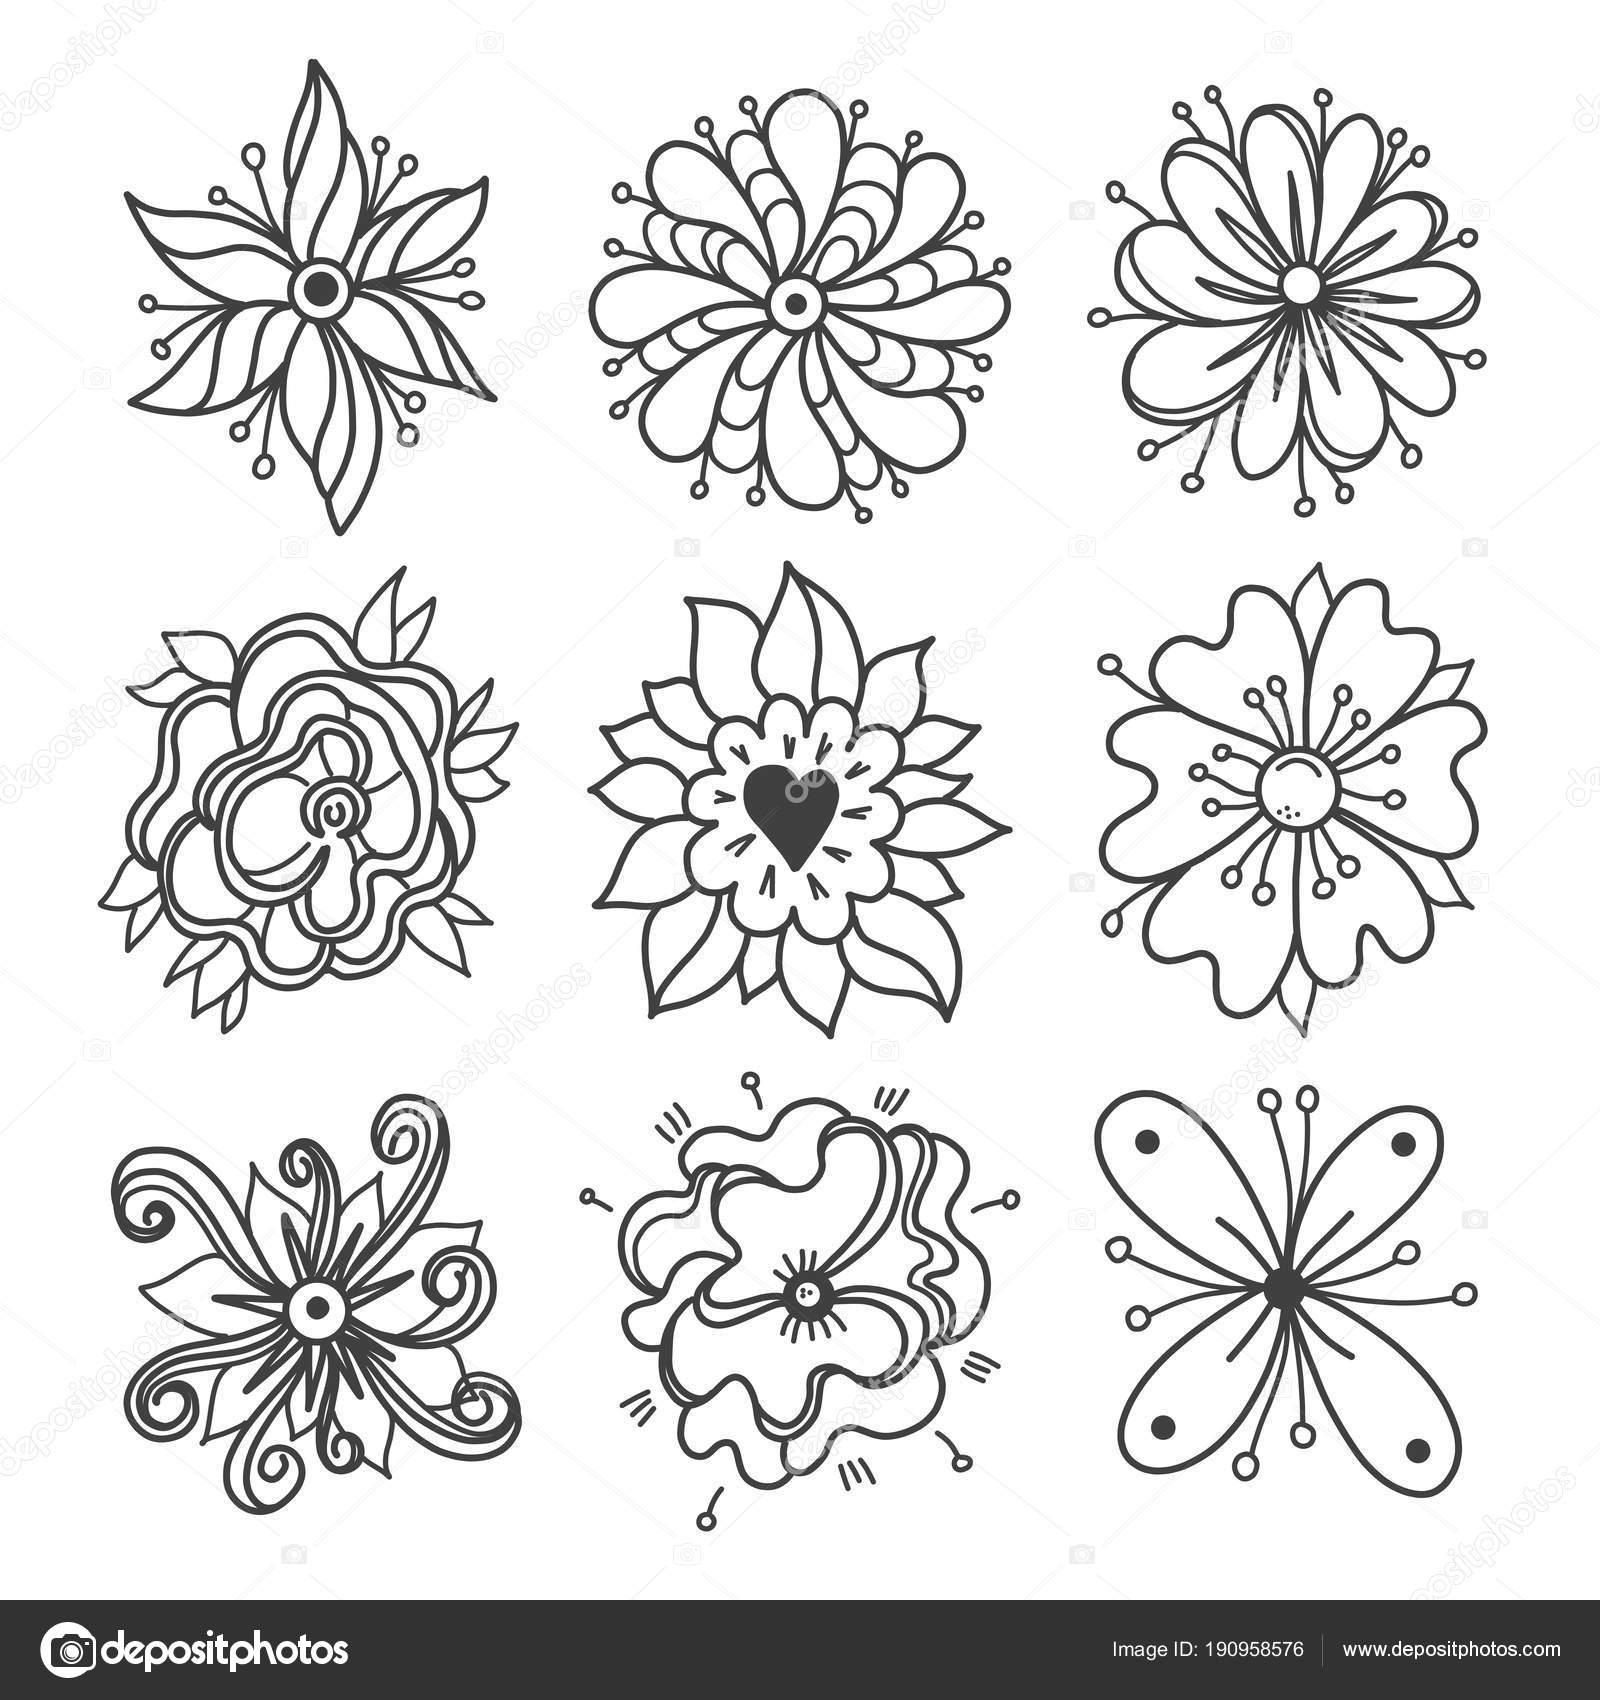 Jednoduche Kvetinove Prvky Rucne Kreslene Kvetiny Prvky Cmarani